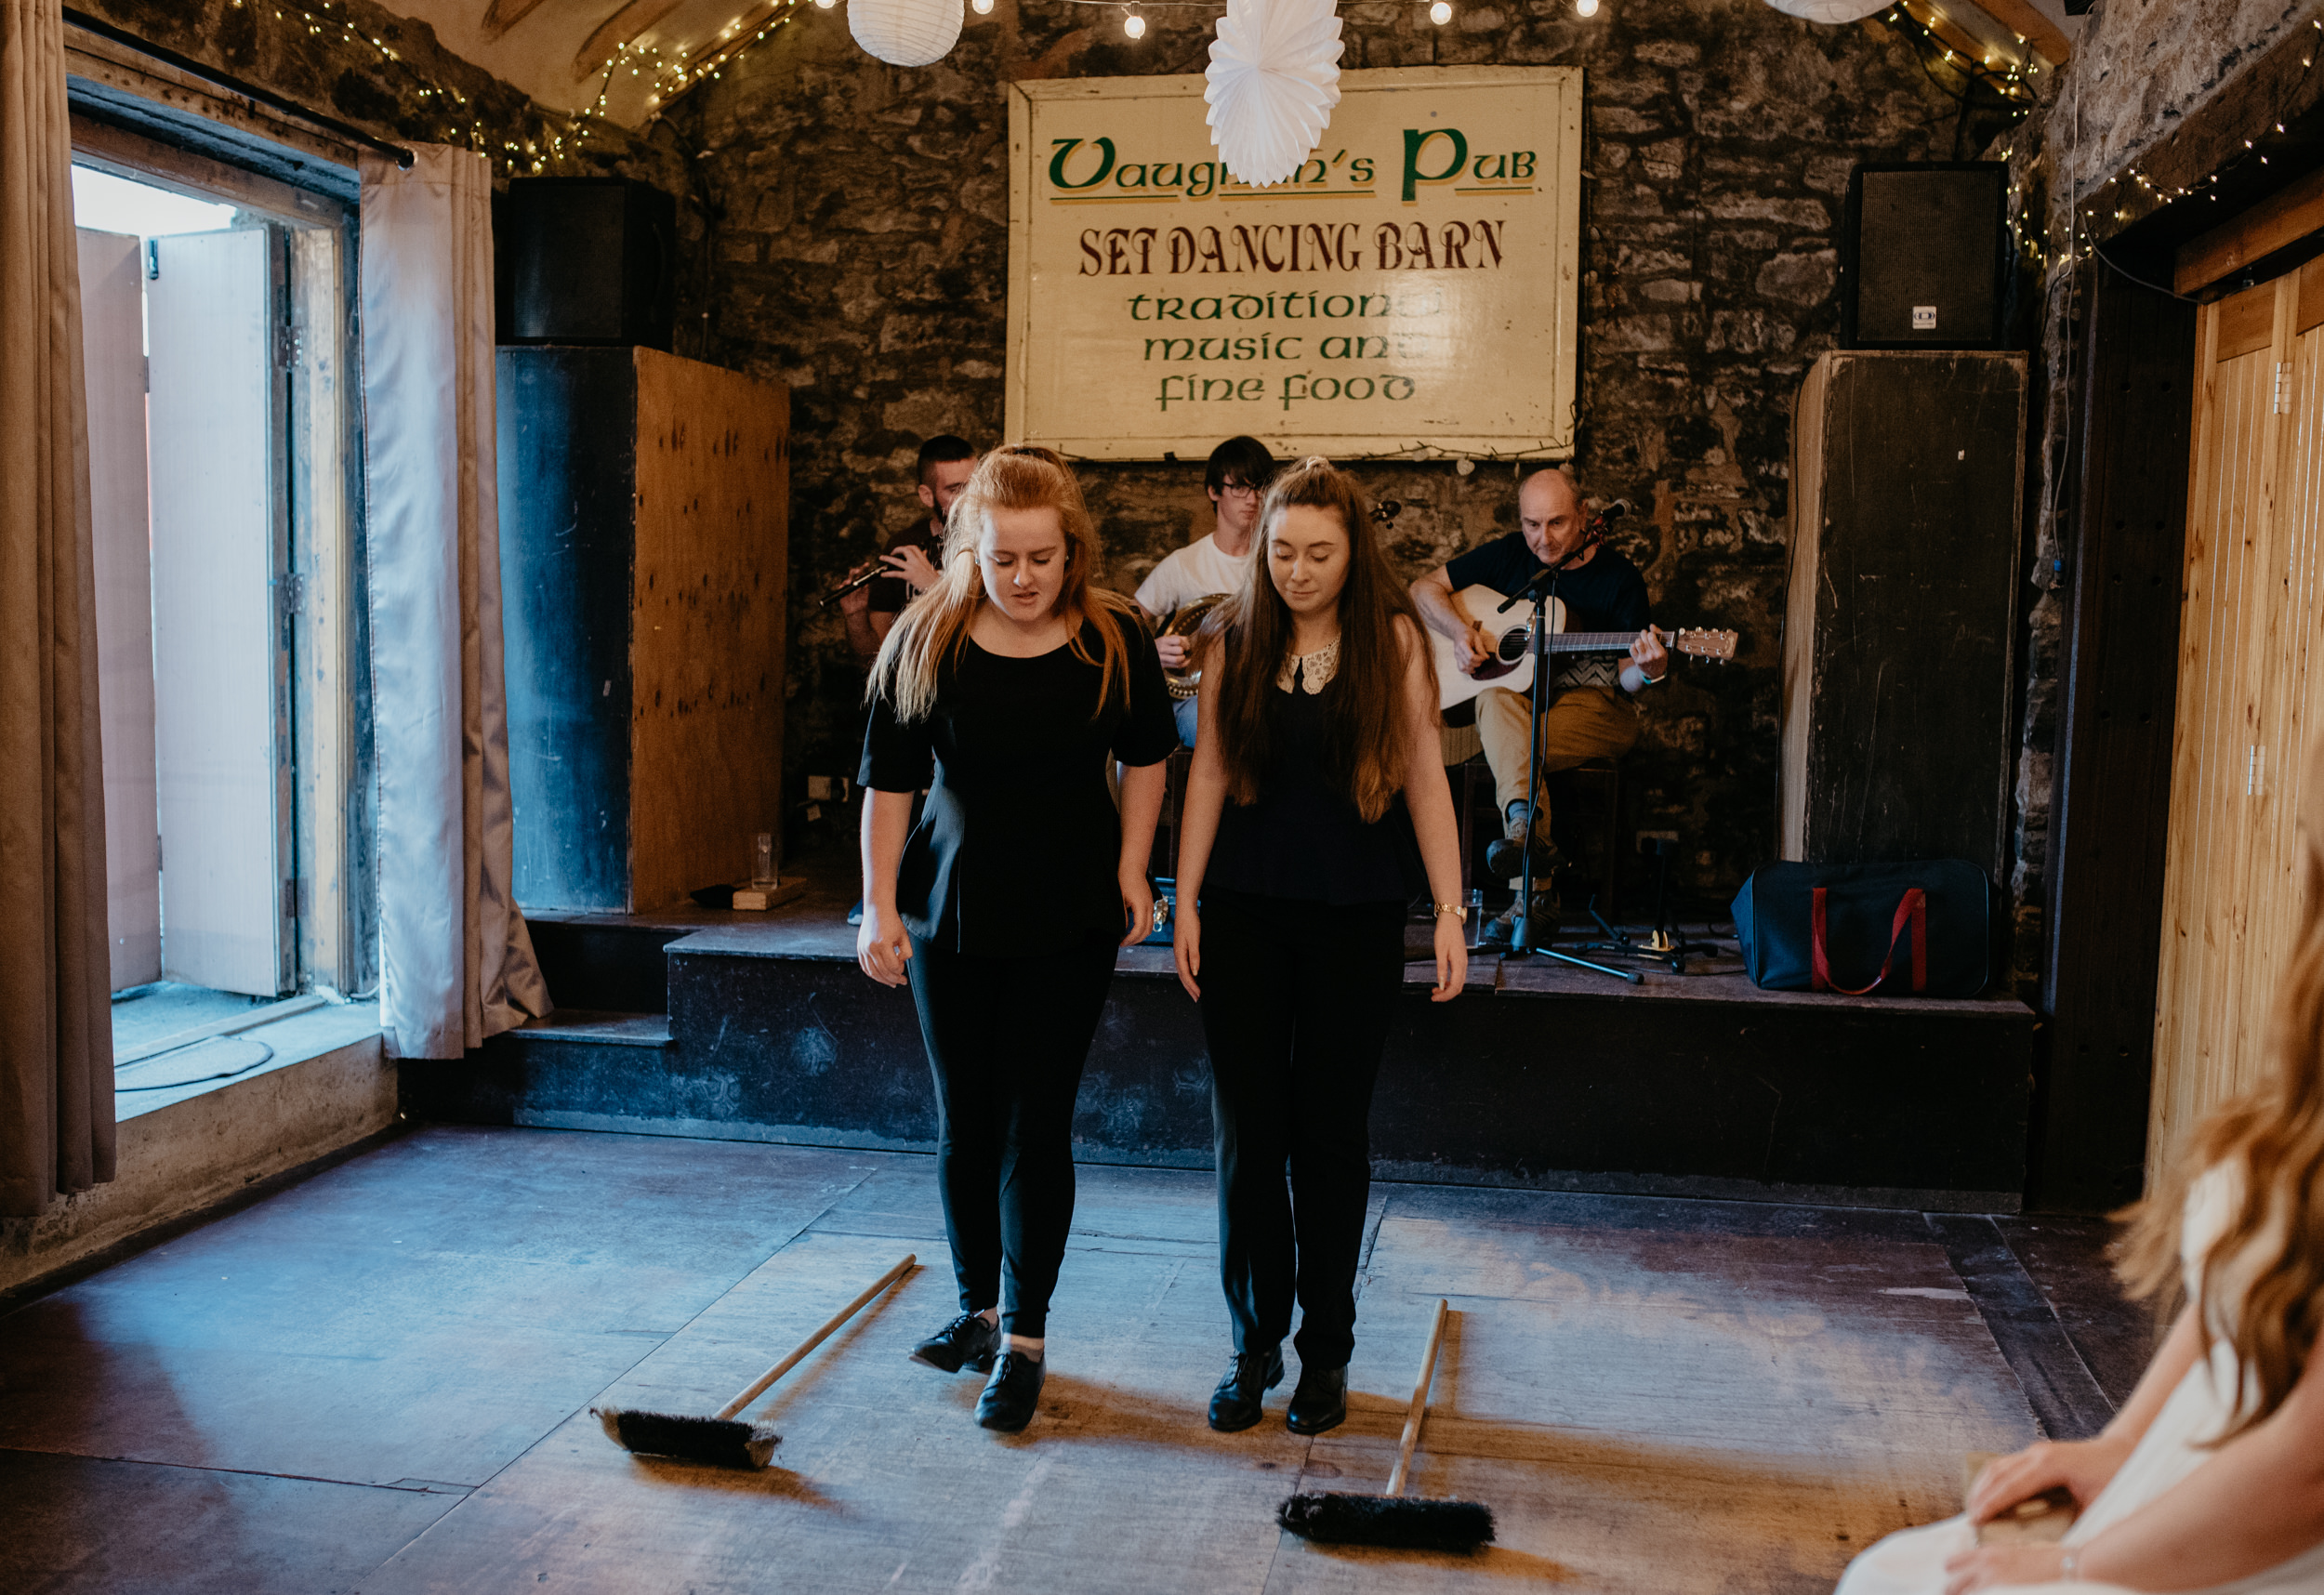 Ireland destination wedding photos. Reception at Vaughan's Pub in Kilfenora, Ireland. Newtown Castle wedding. County Clare wedding and elopement photographer. Cliffs of Moher elopement.